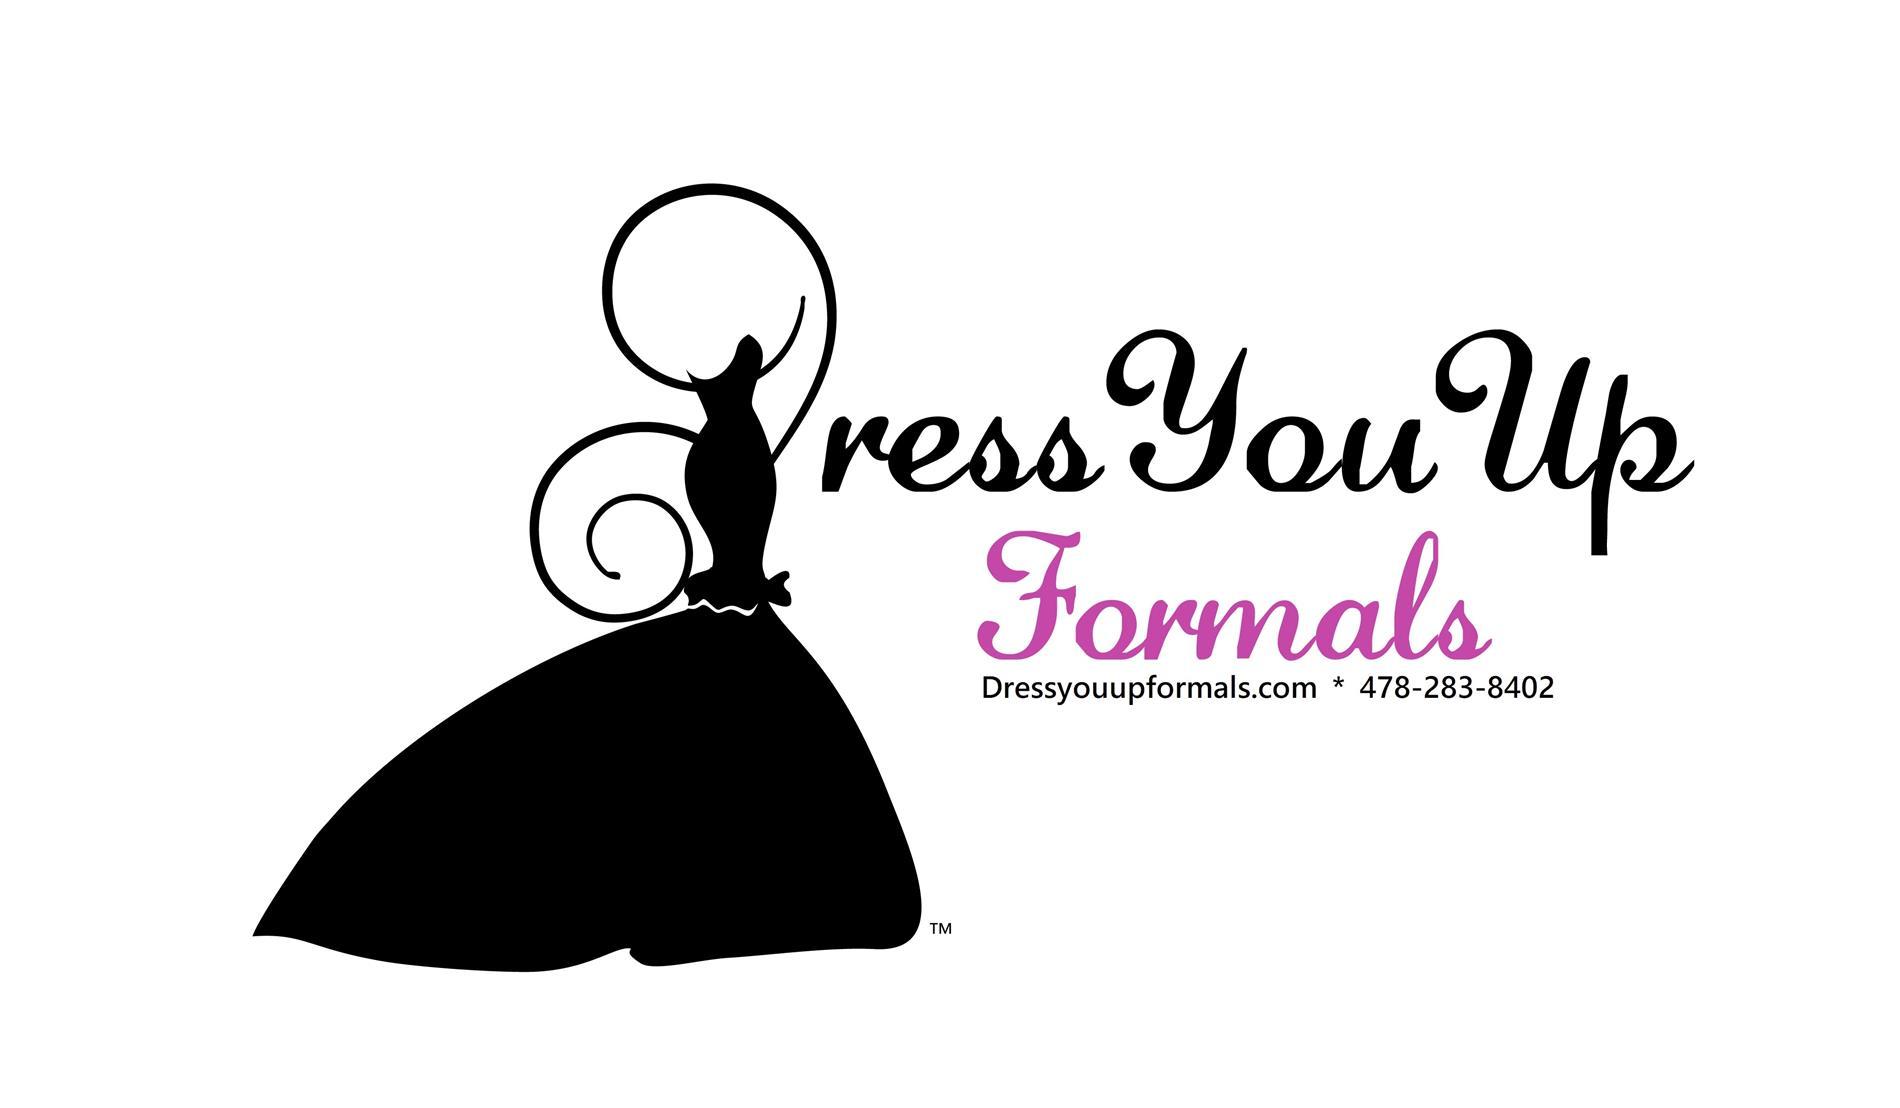 Dress You Up Formals